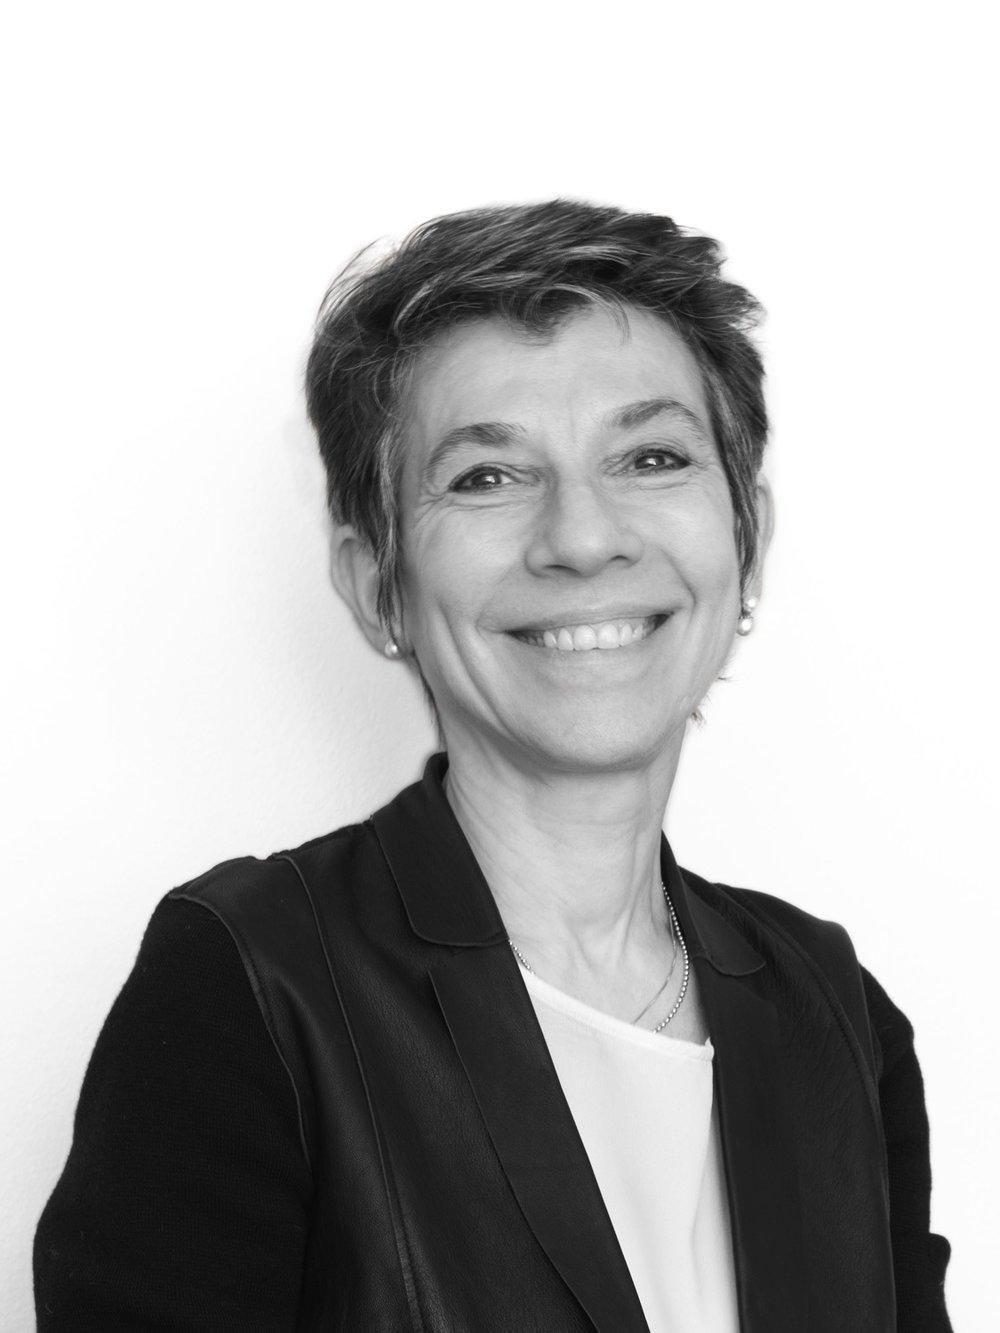 Betina Schlossberg